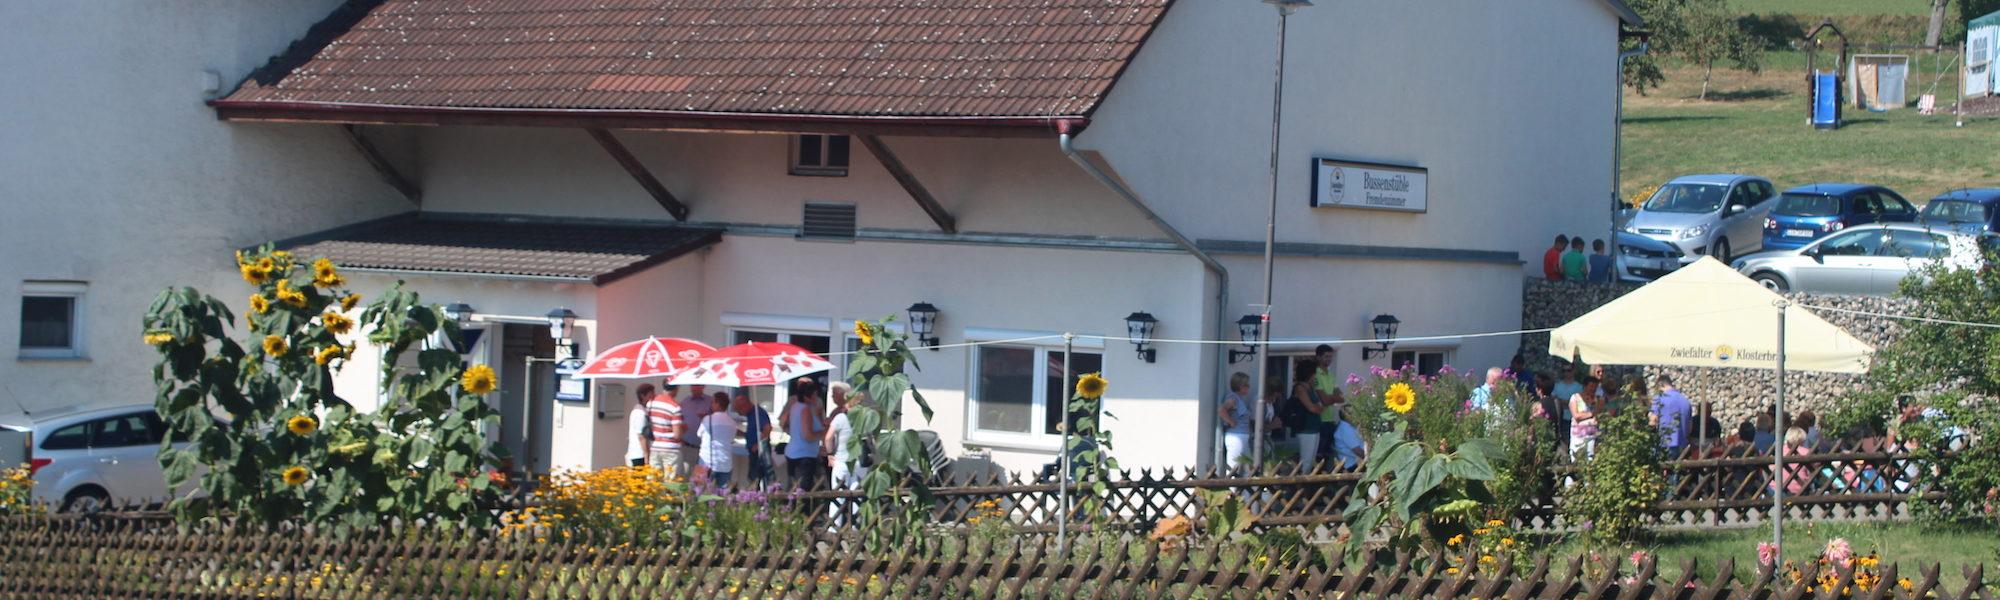 Restaurant bei Riedlingen